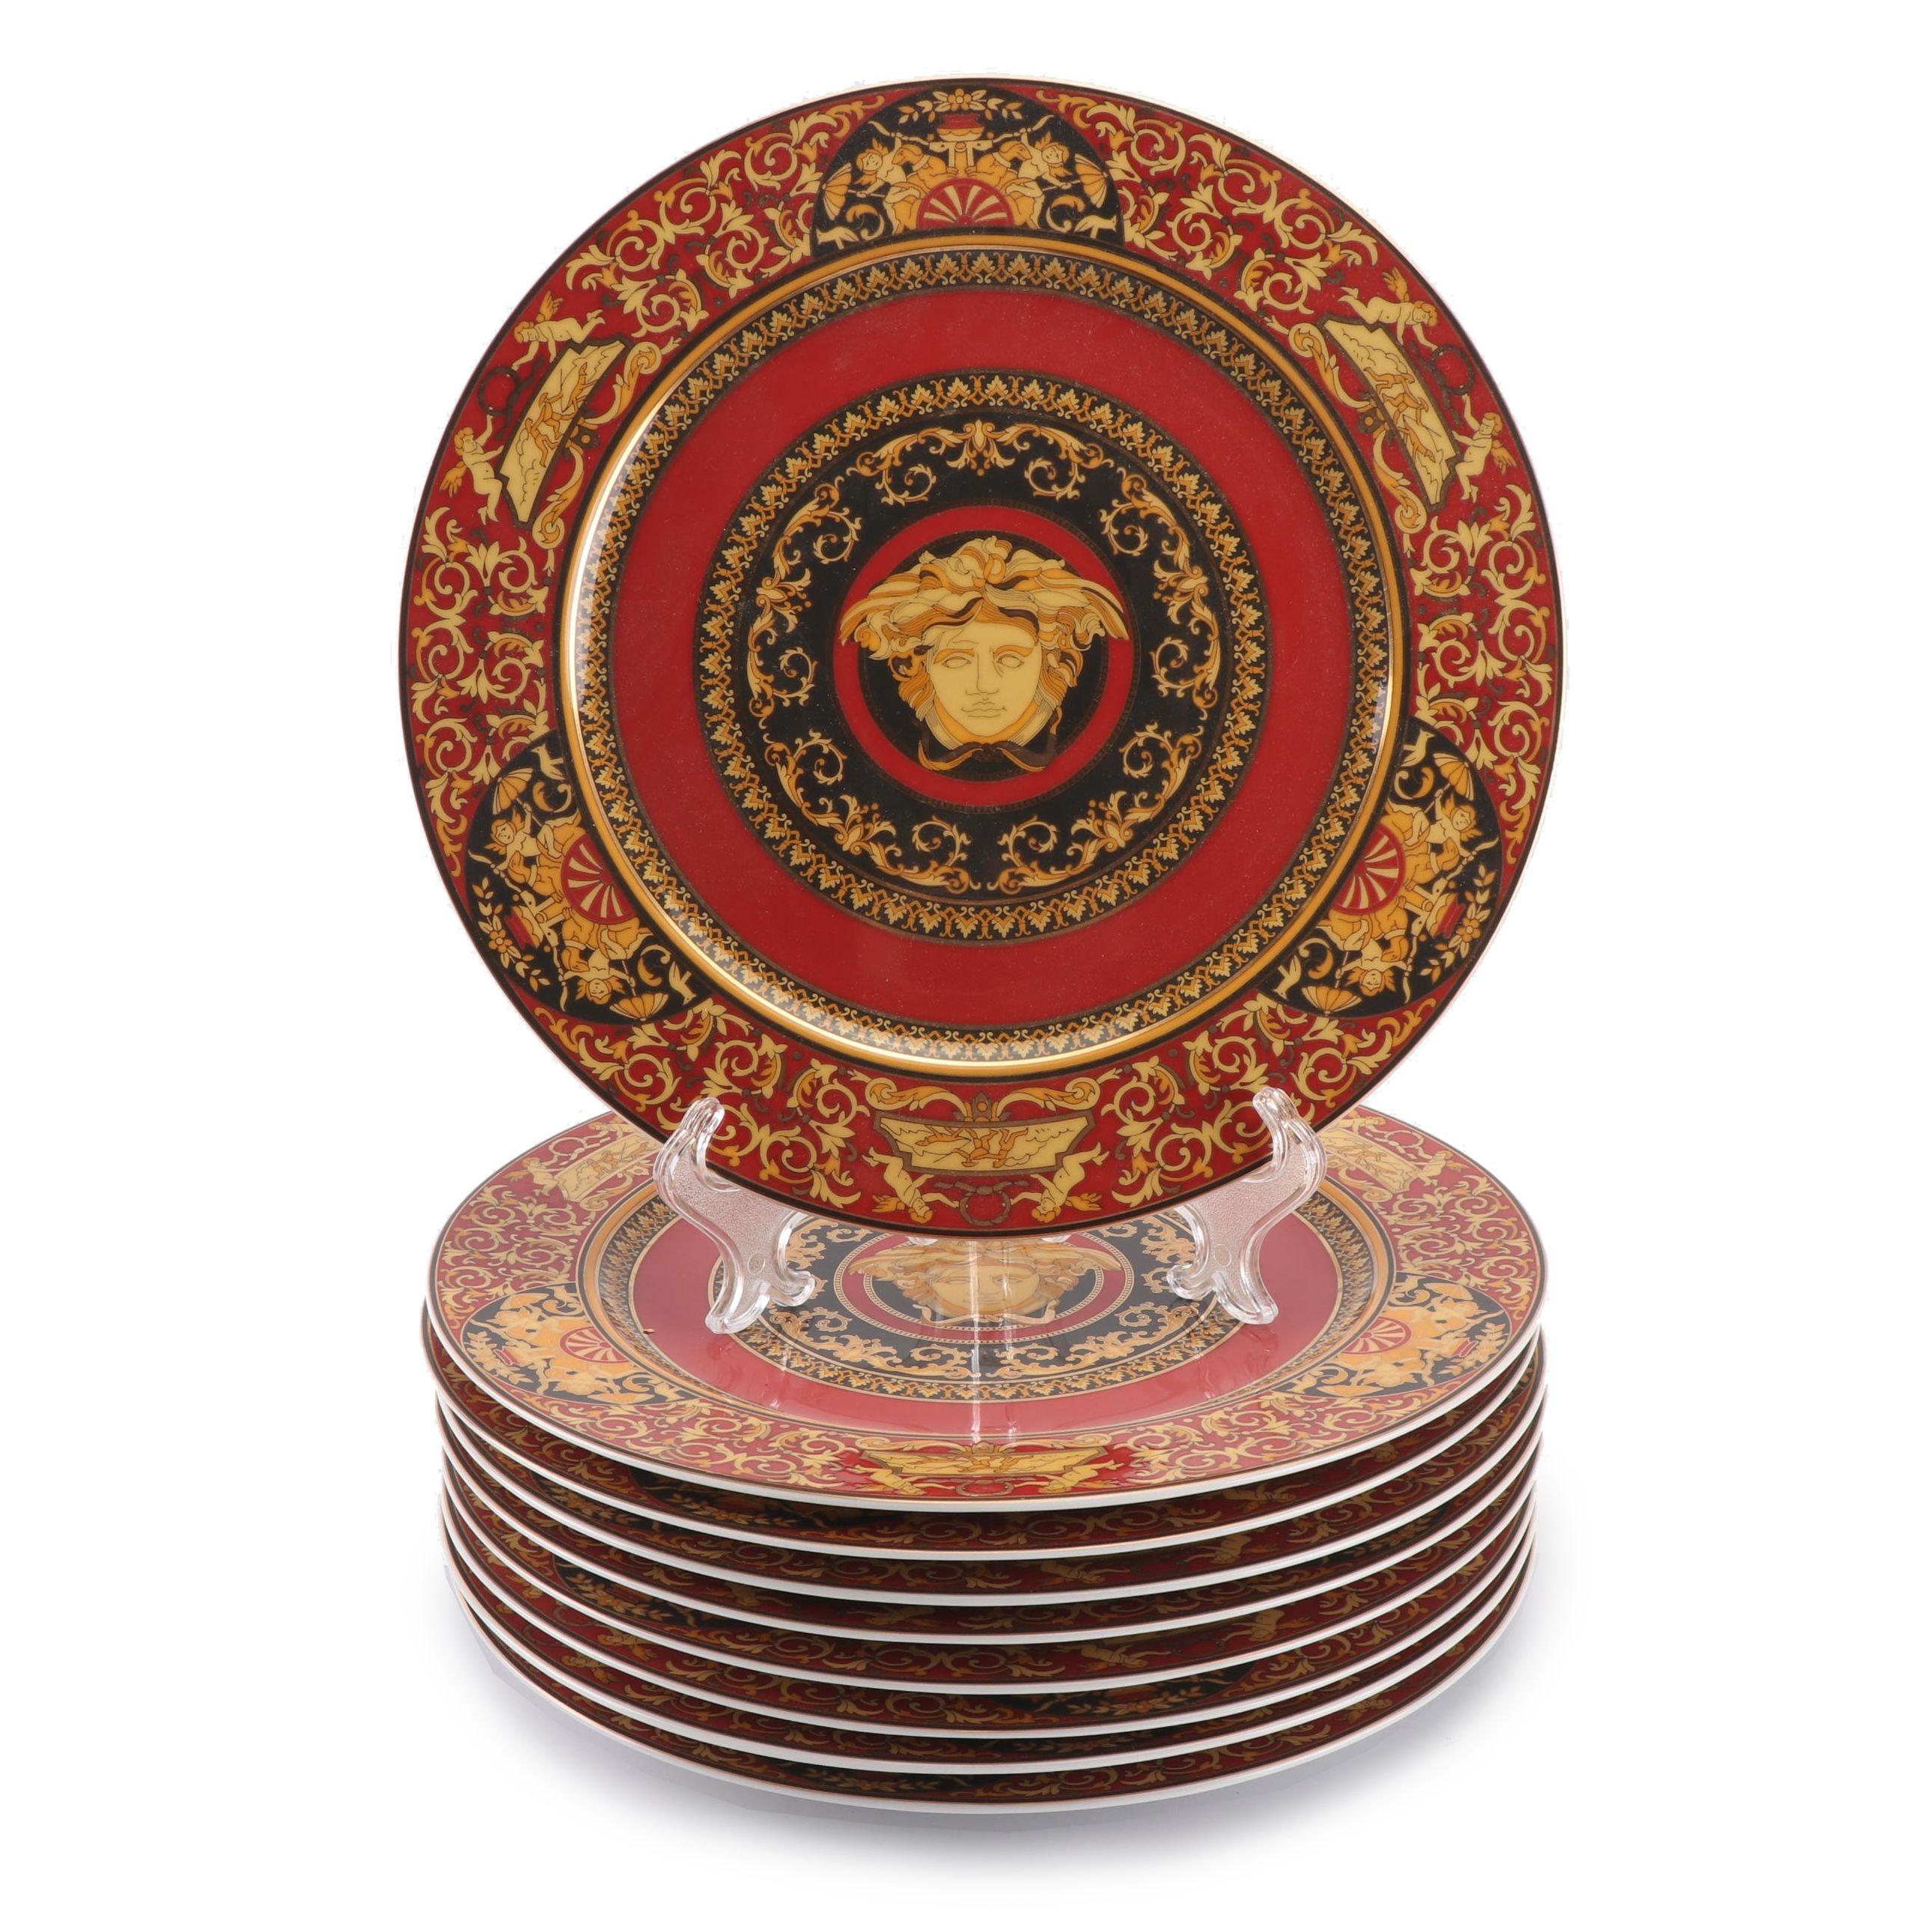 "Versace for Rosenthal ""Medusa Red"" Porcelain Service Plates"